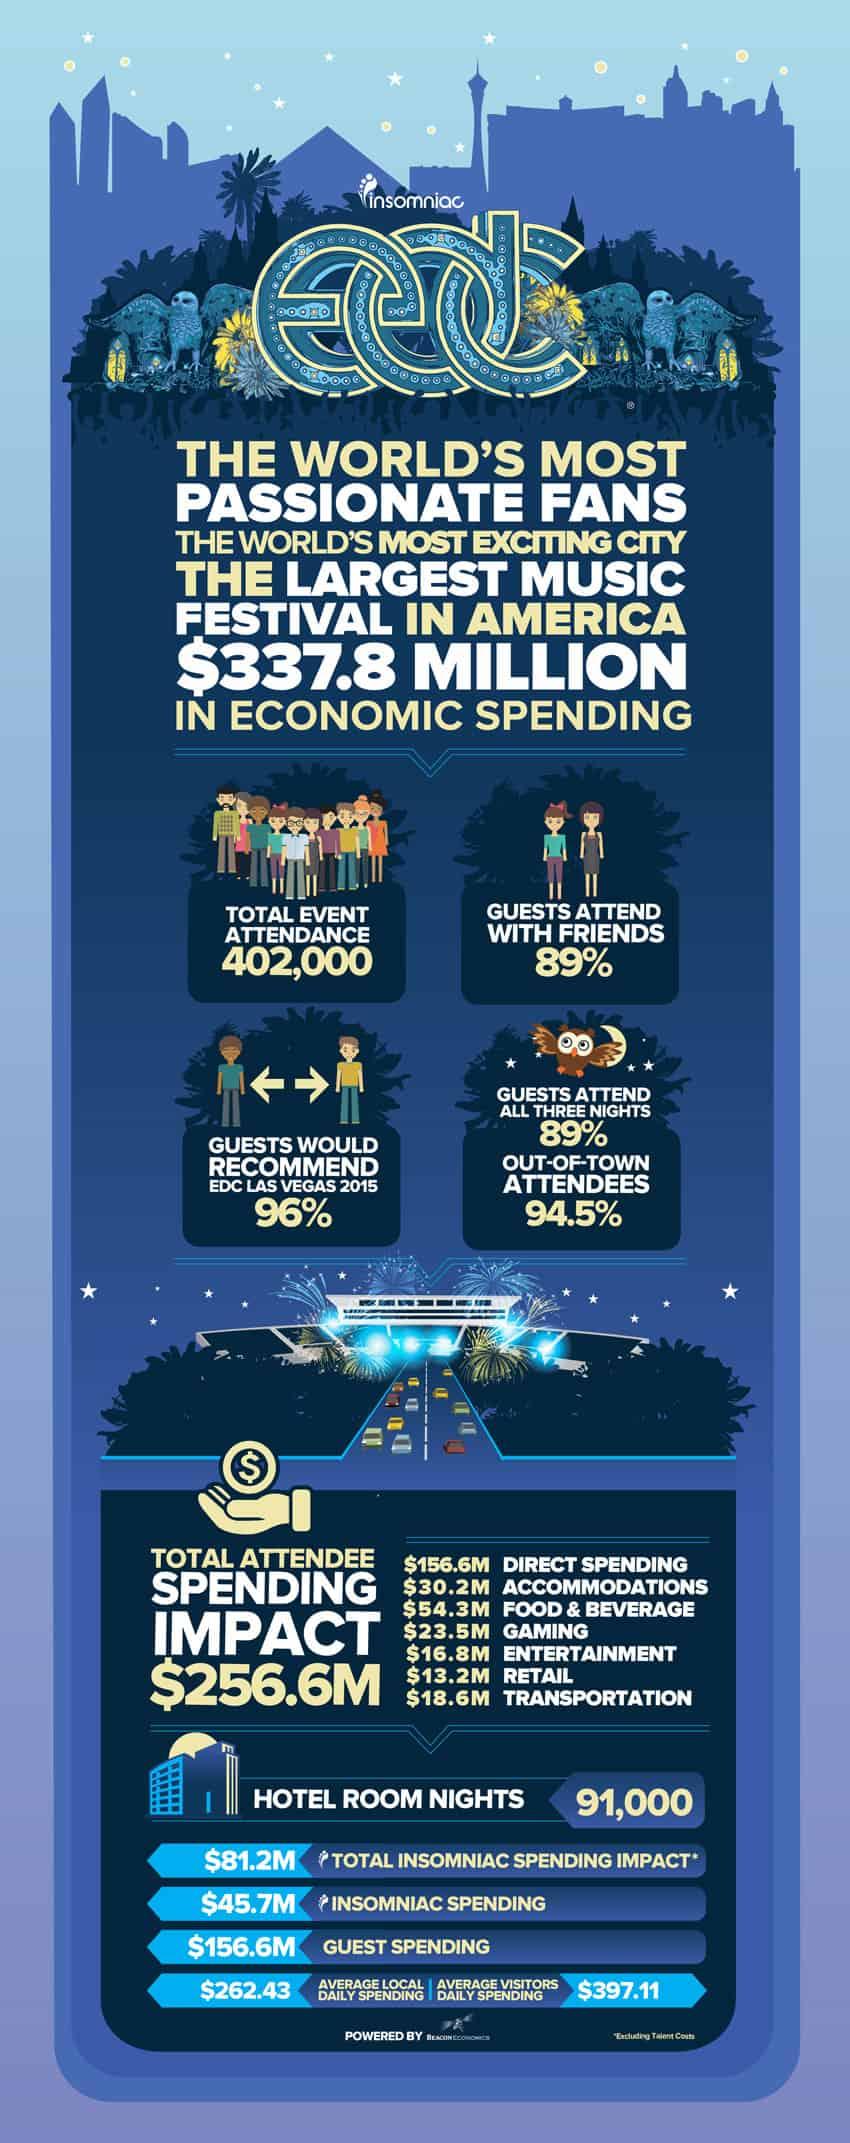 EDC Las Vegas 2014 Generated $337 Million For Clark County